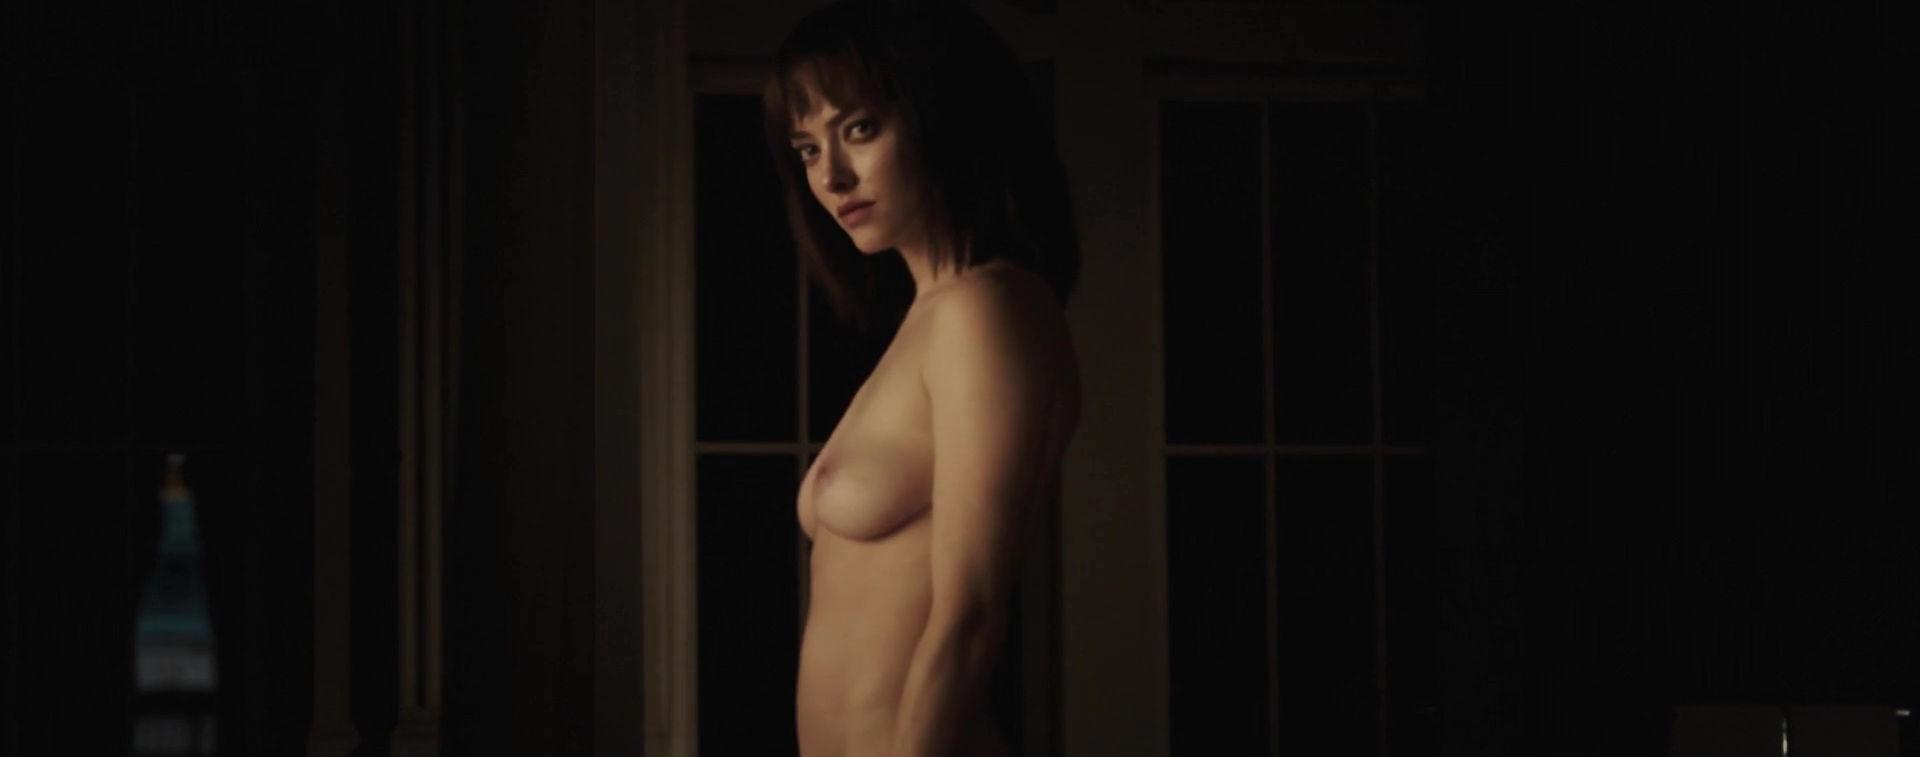 fotos de Amanda Seyfried desnuda